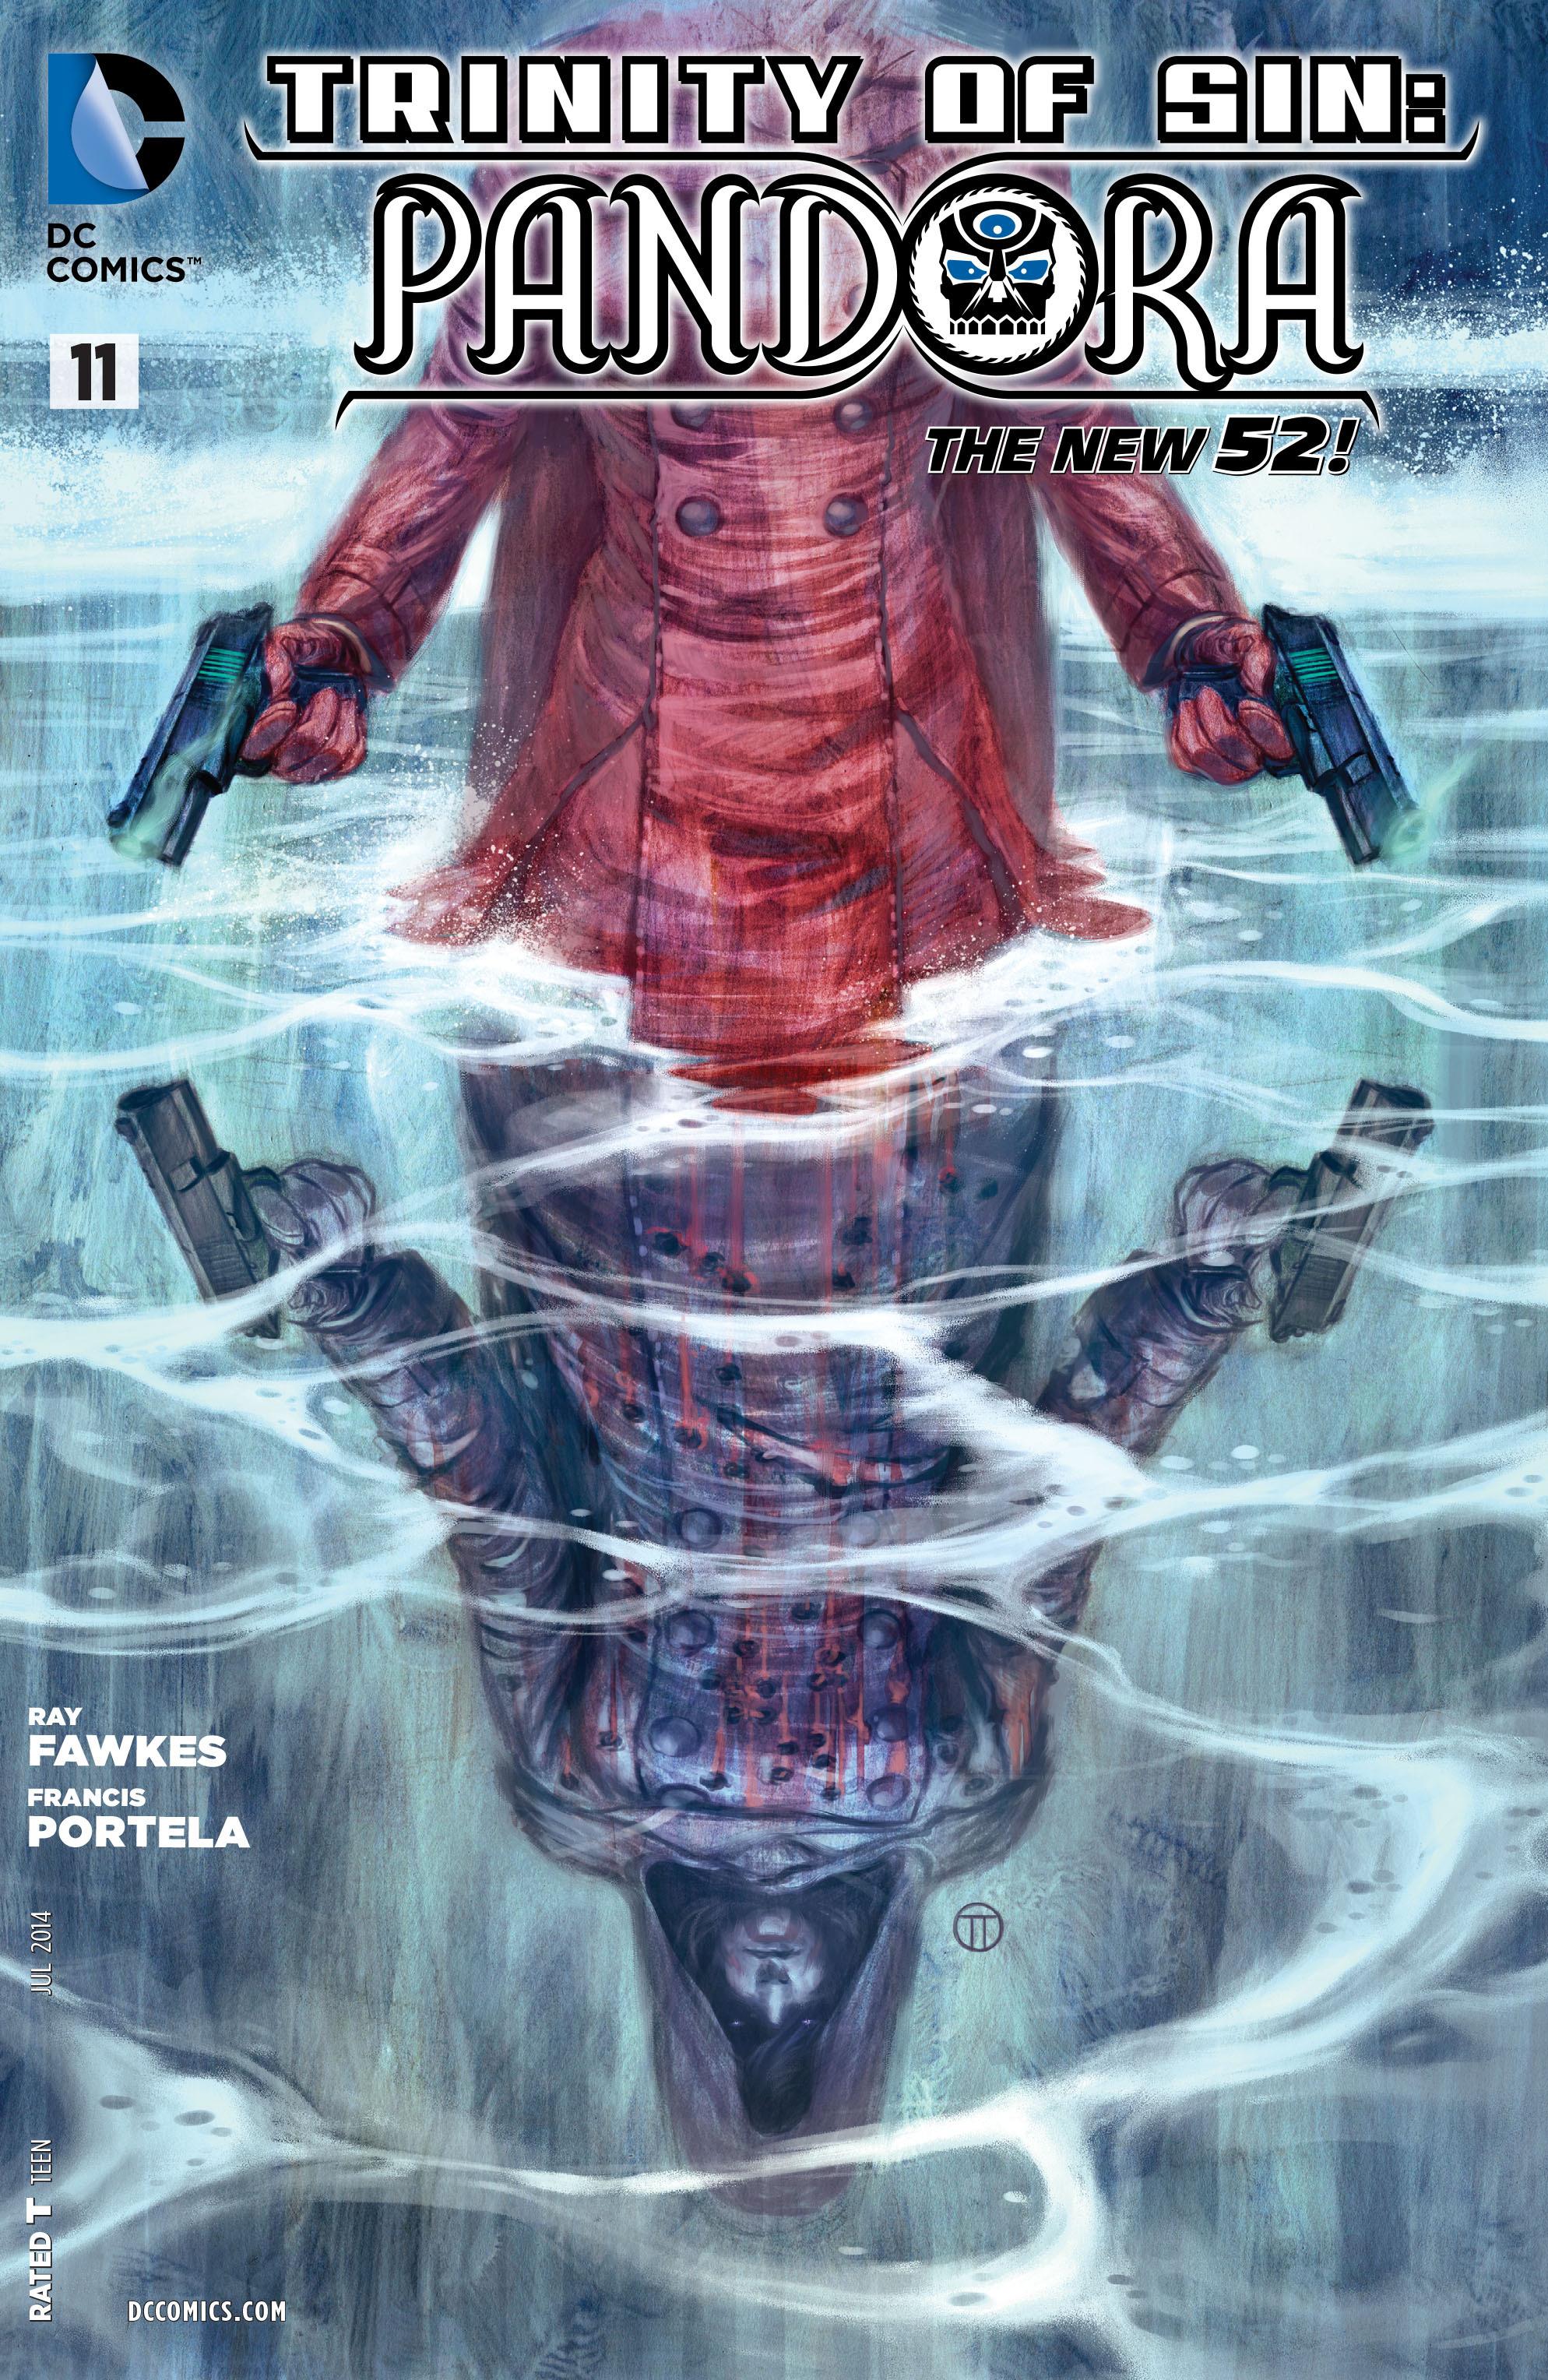 Read online Trinity of Sin: Pandora comic -  Issue #11 - 1